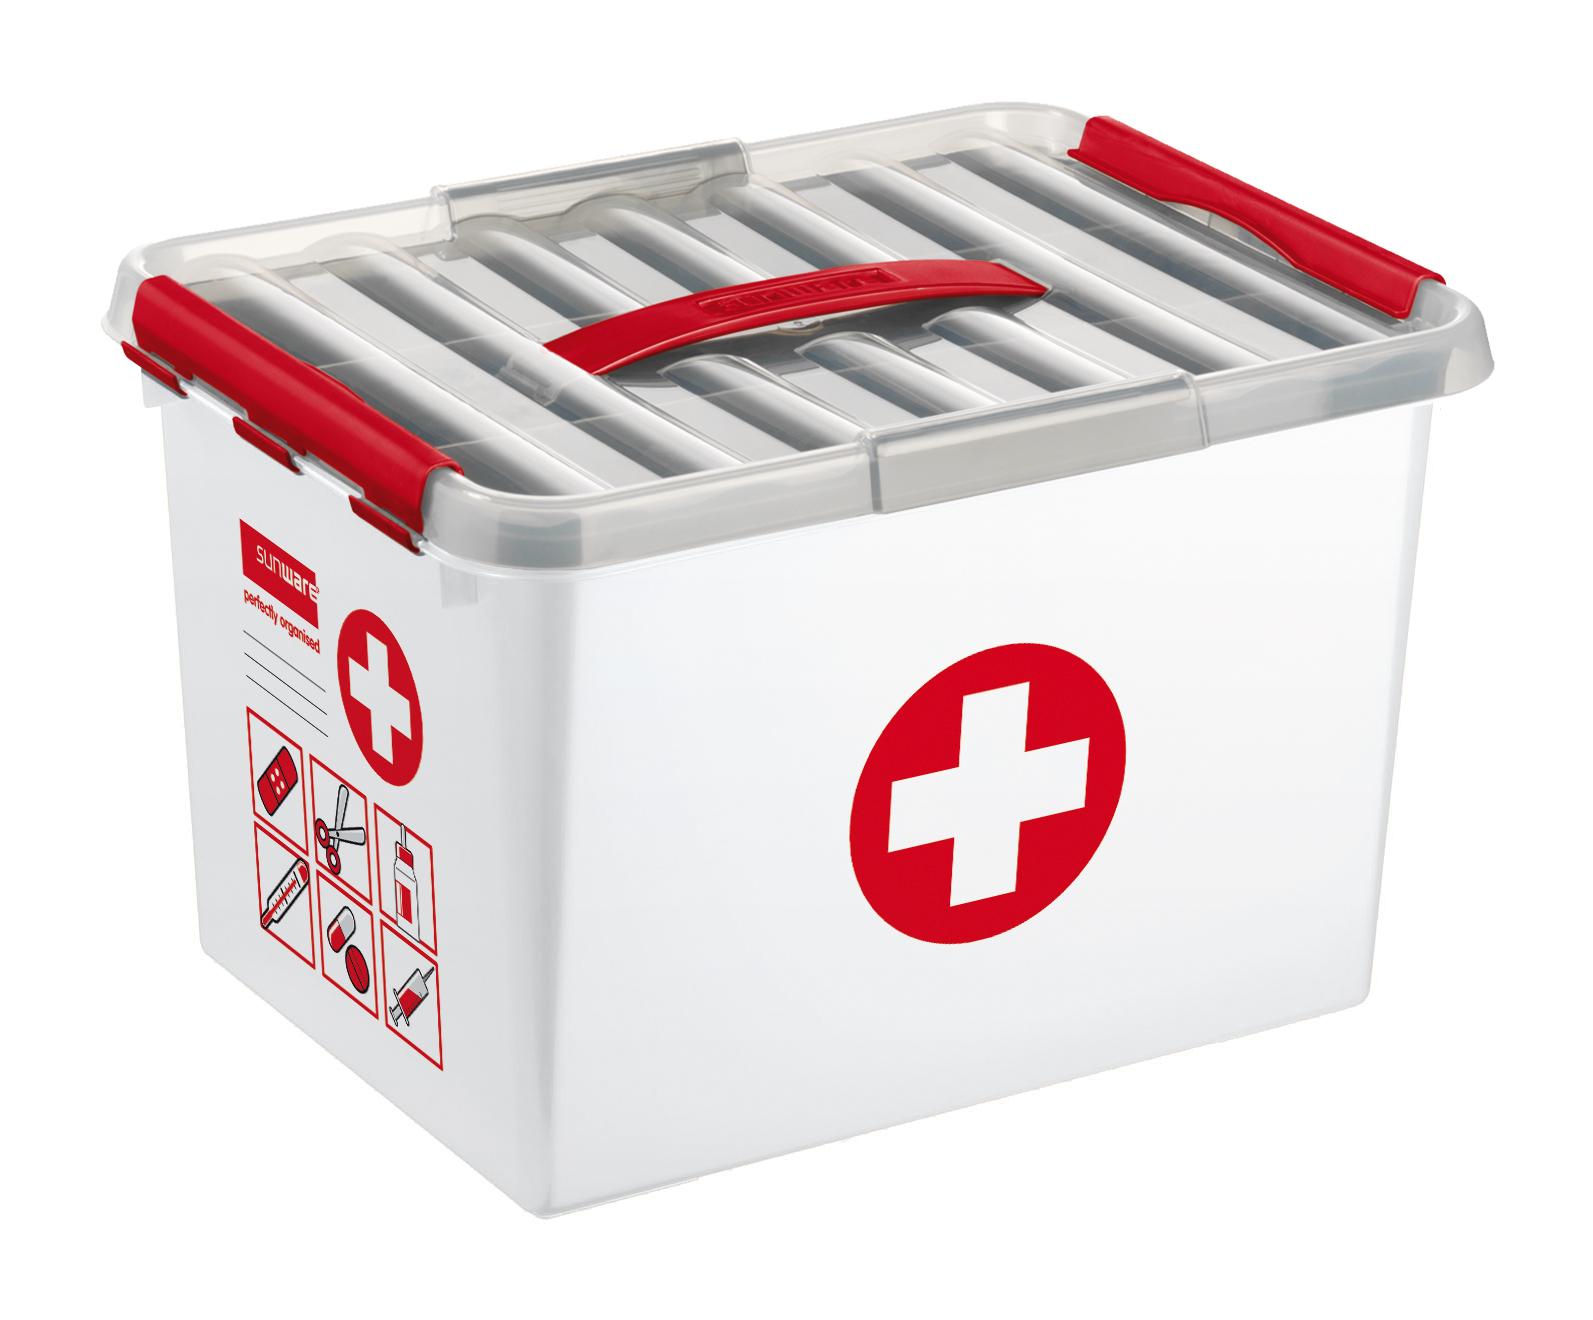 baumarkt egger haushalt gesundheit sunware q line first aid box 22 liter 79802604. Black Bedroom Furniture Sets. Home Design Ideas